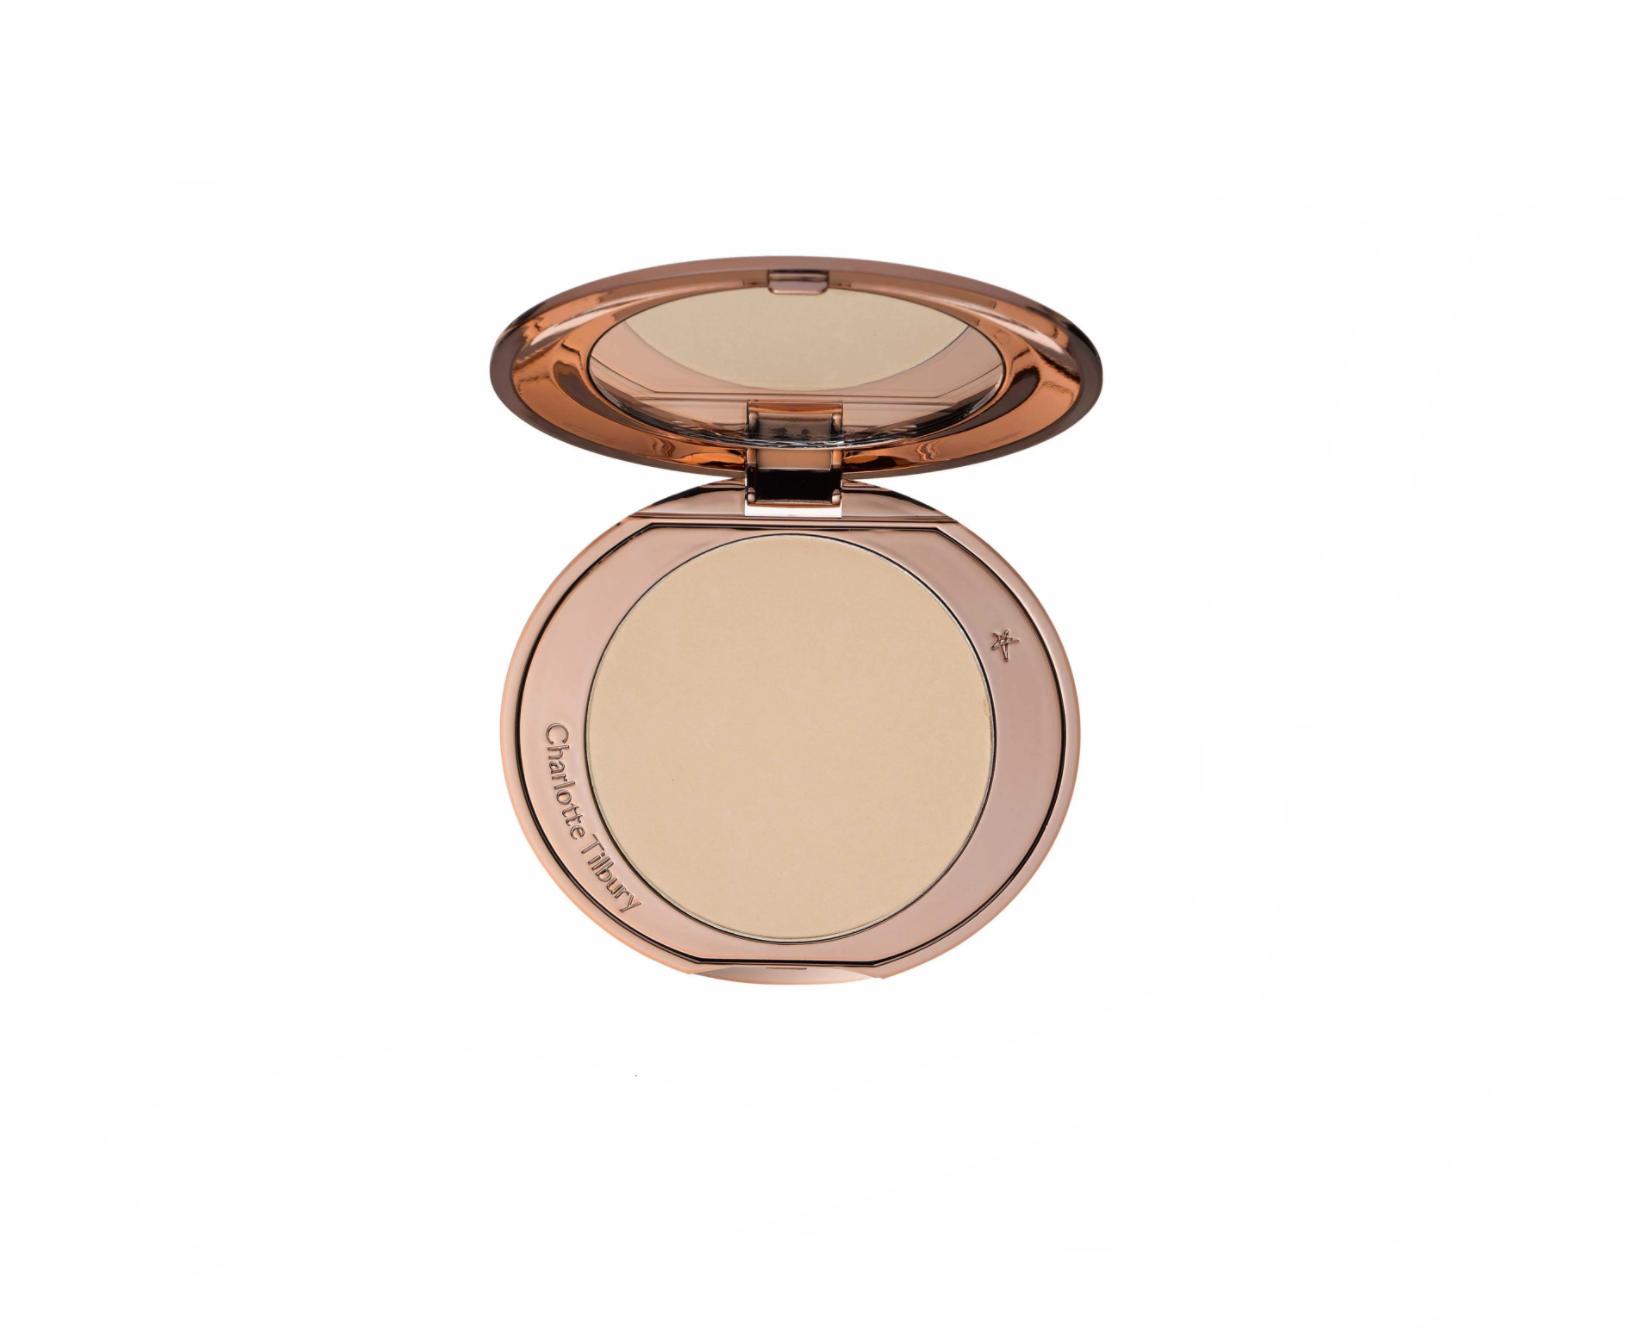 Charlotte Tilbury  AIRBRUSH FLAWLESS FINISH  2 MEDIUM  Skin Perfecting Micro-Powder